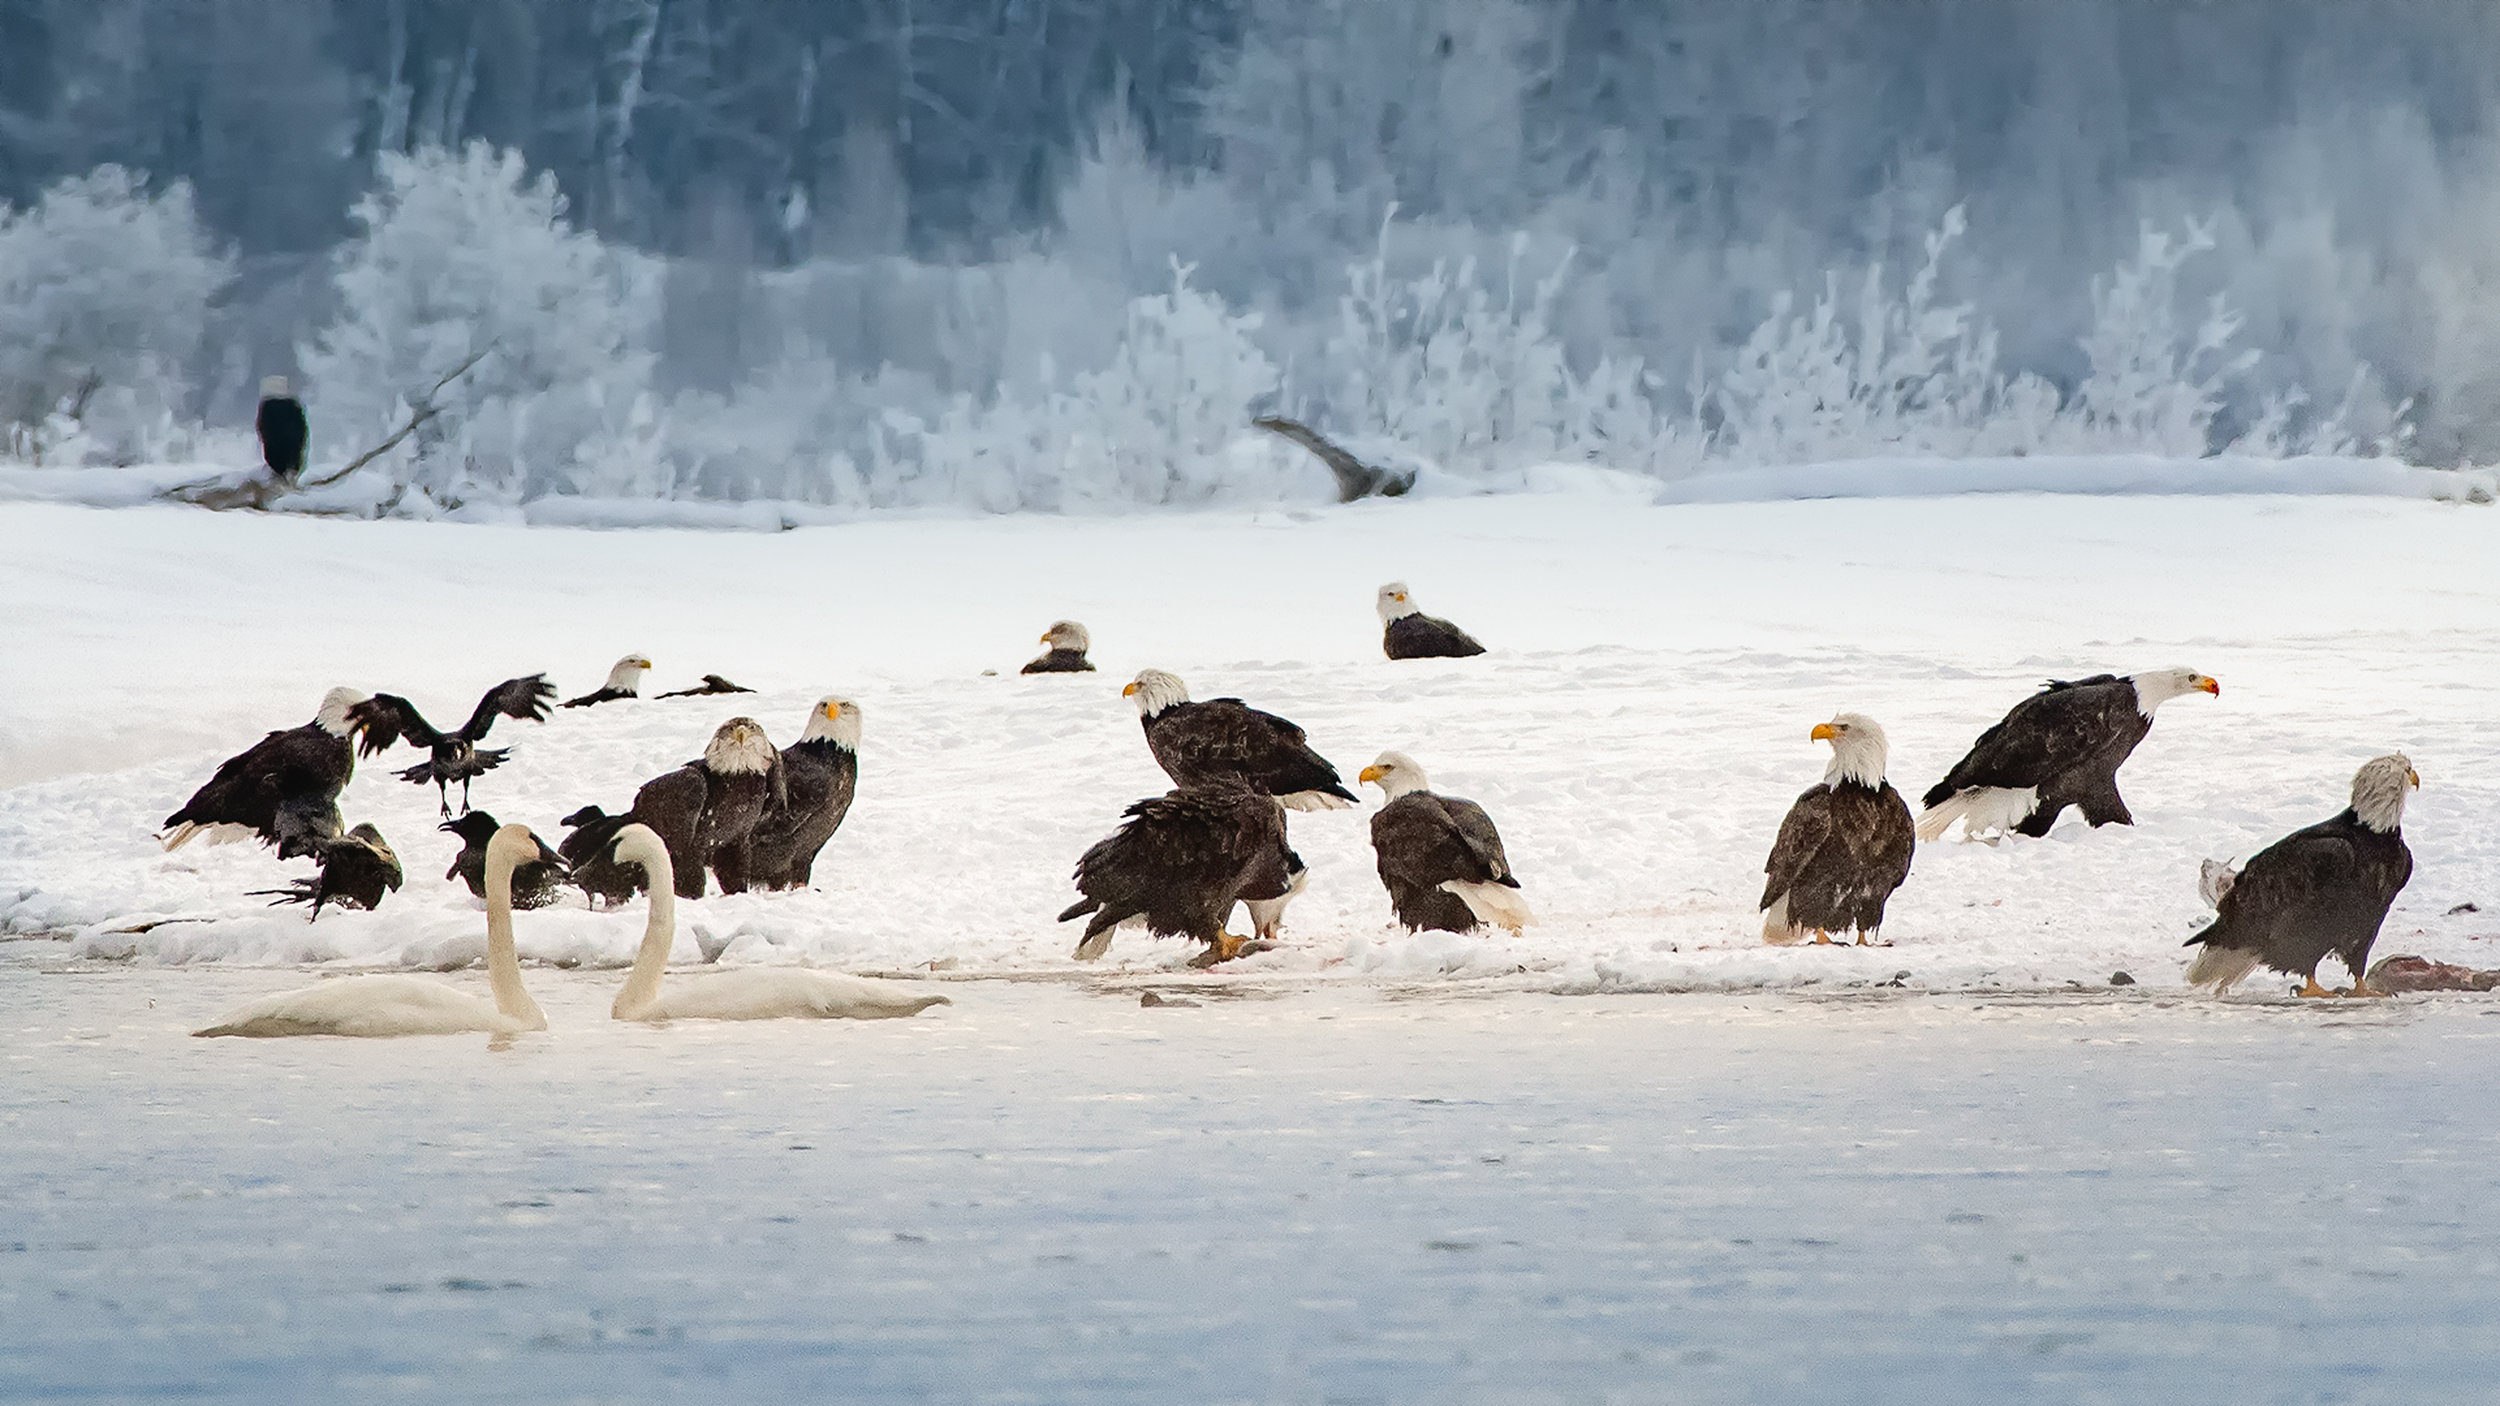 P. EaglePortfolio_Image_14_©BrianRiveraUncapher.jpg